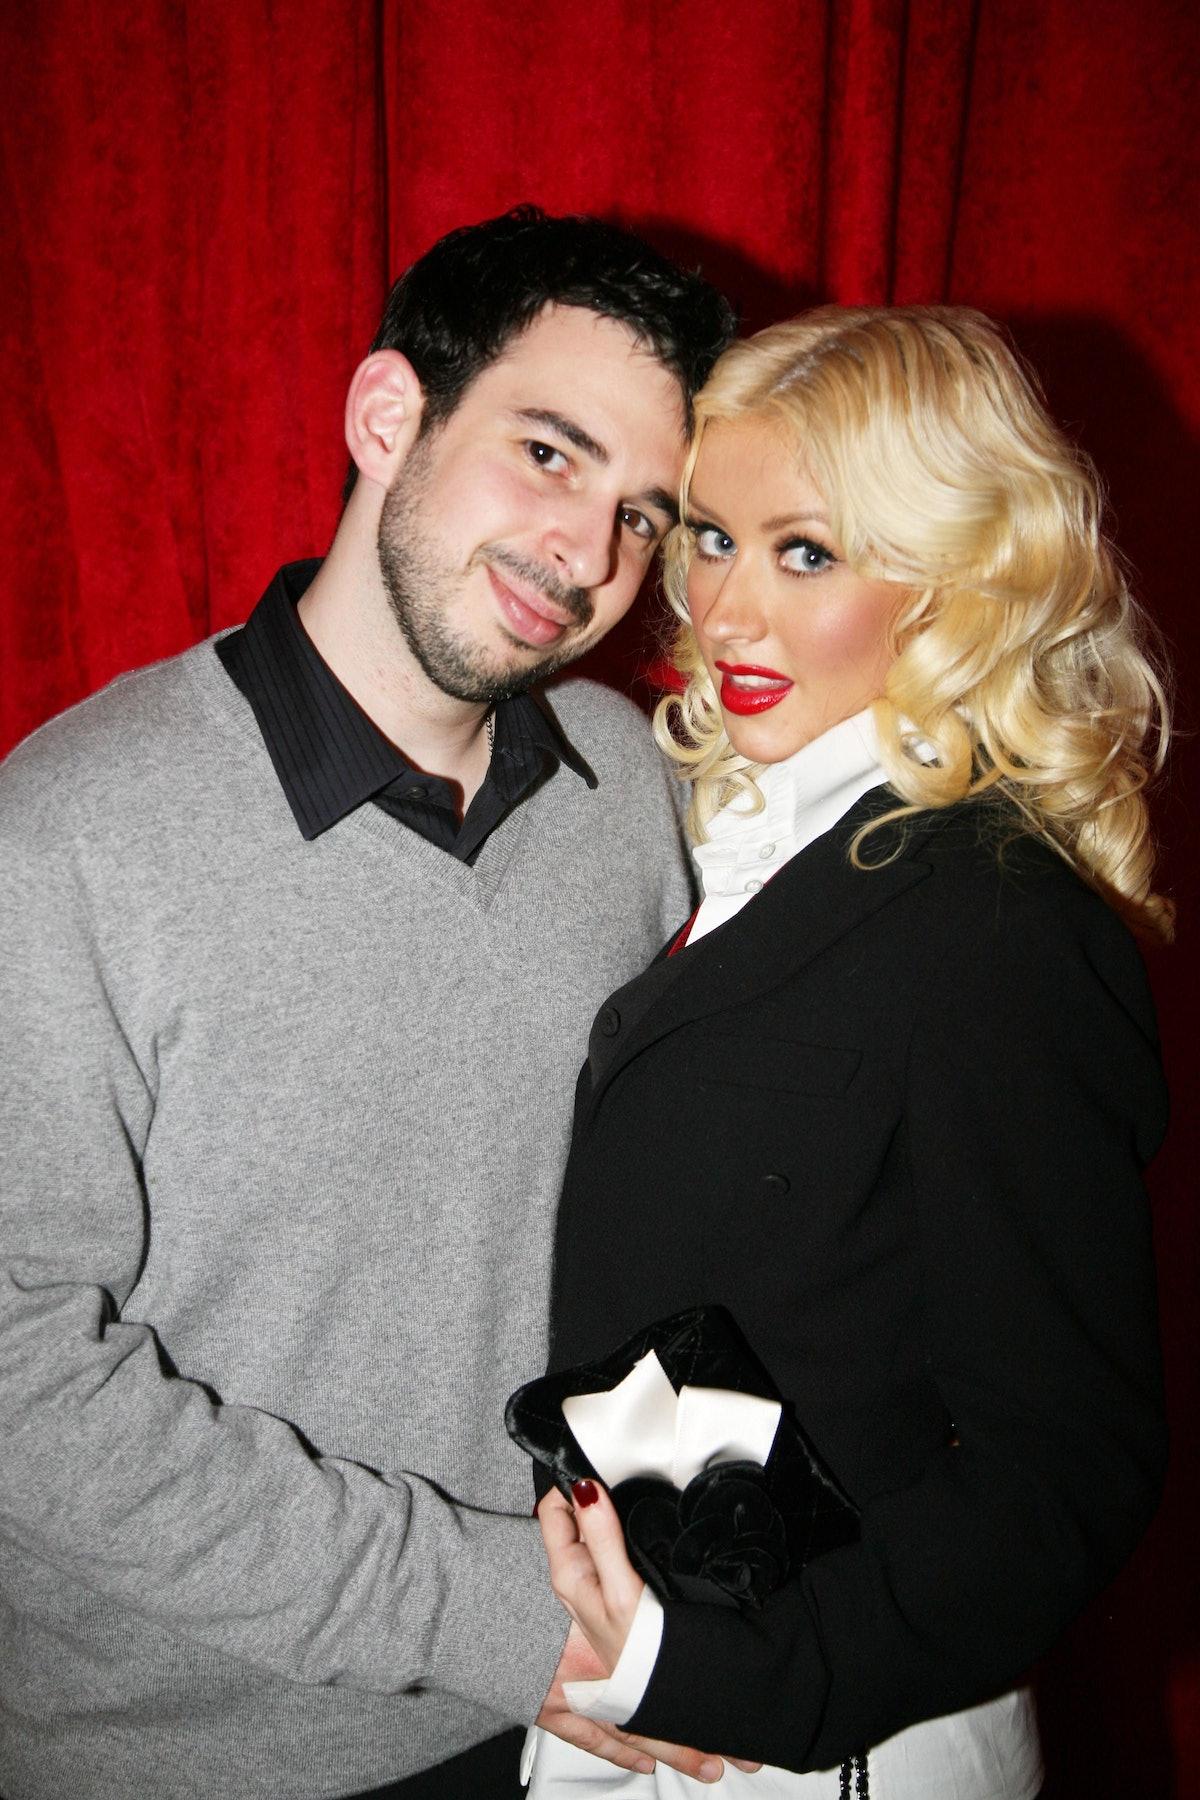 NEW YORK CITY, NY - SEPTEMBER 6: Jordan Bratman and Christina Aguilera attend MAC AIDS FUND Dinner T...